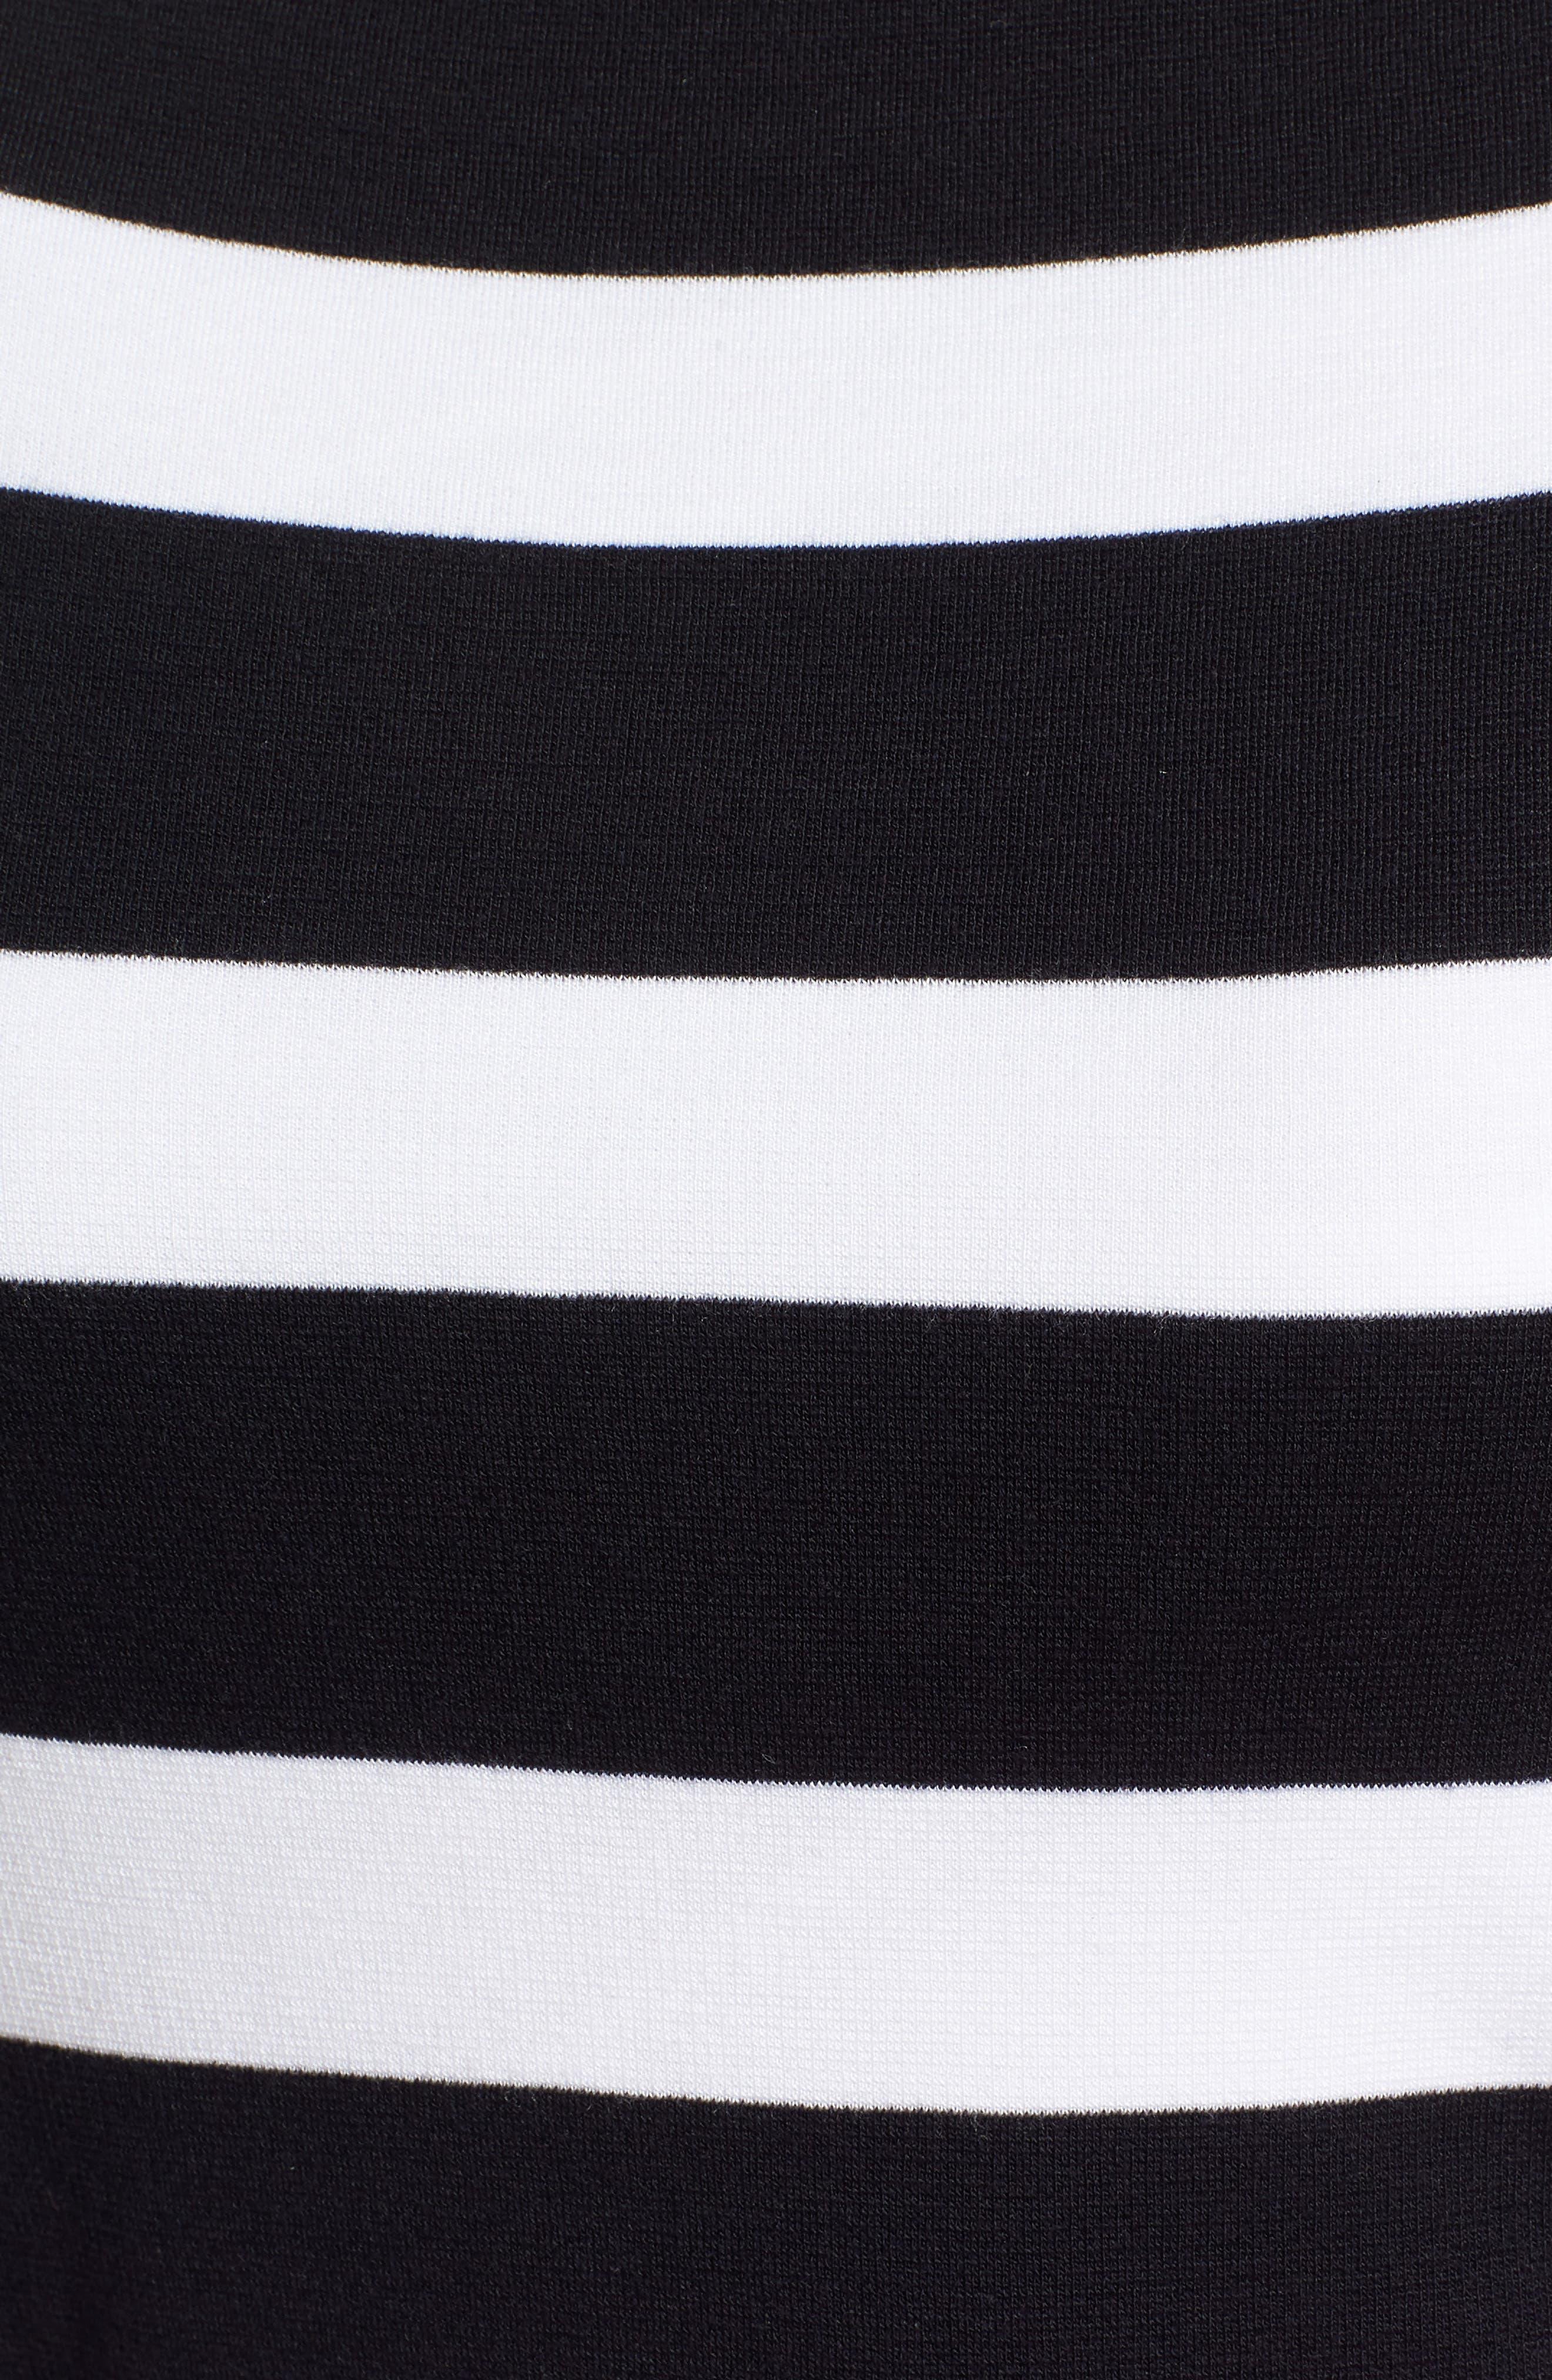 Elsara Stripe Sheath Dress,                             Alternate thumbnail 6, color,                             Navy Fantasy